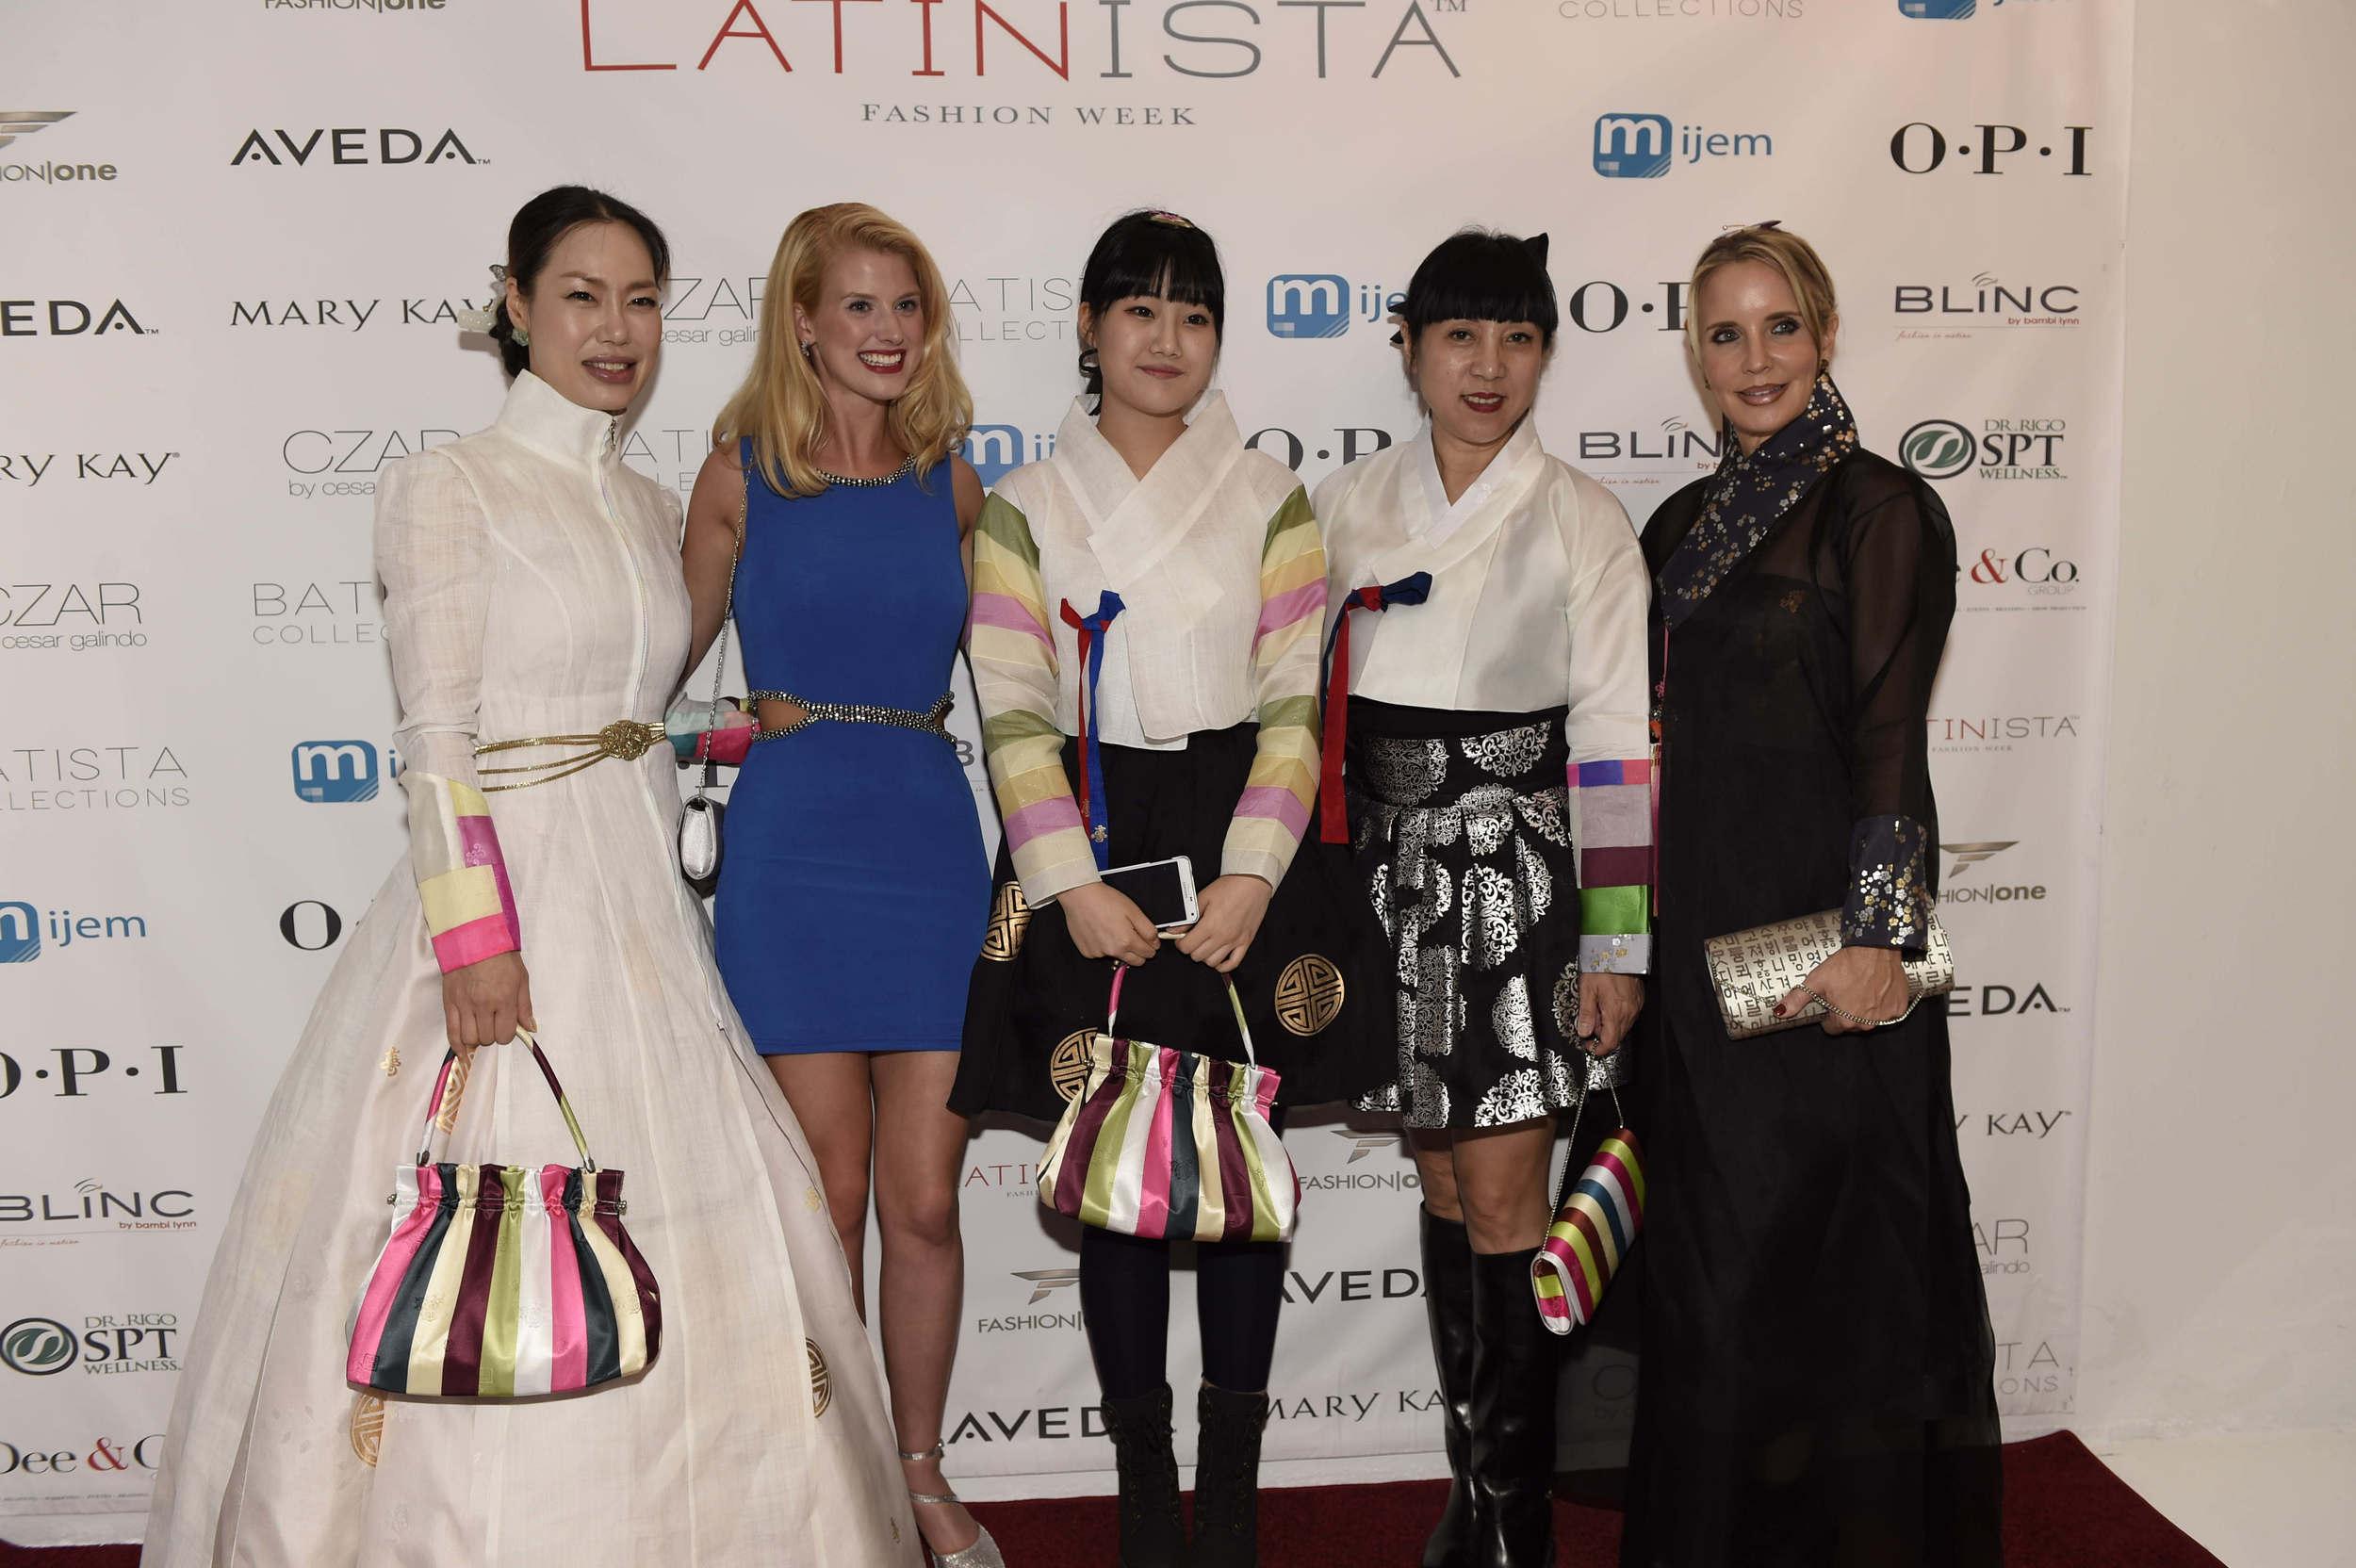 Latinista backstage140.JPG